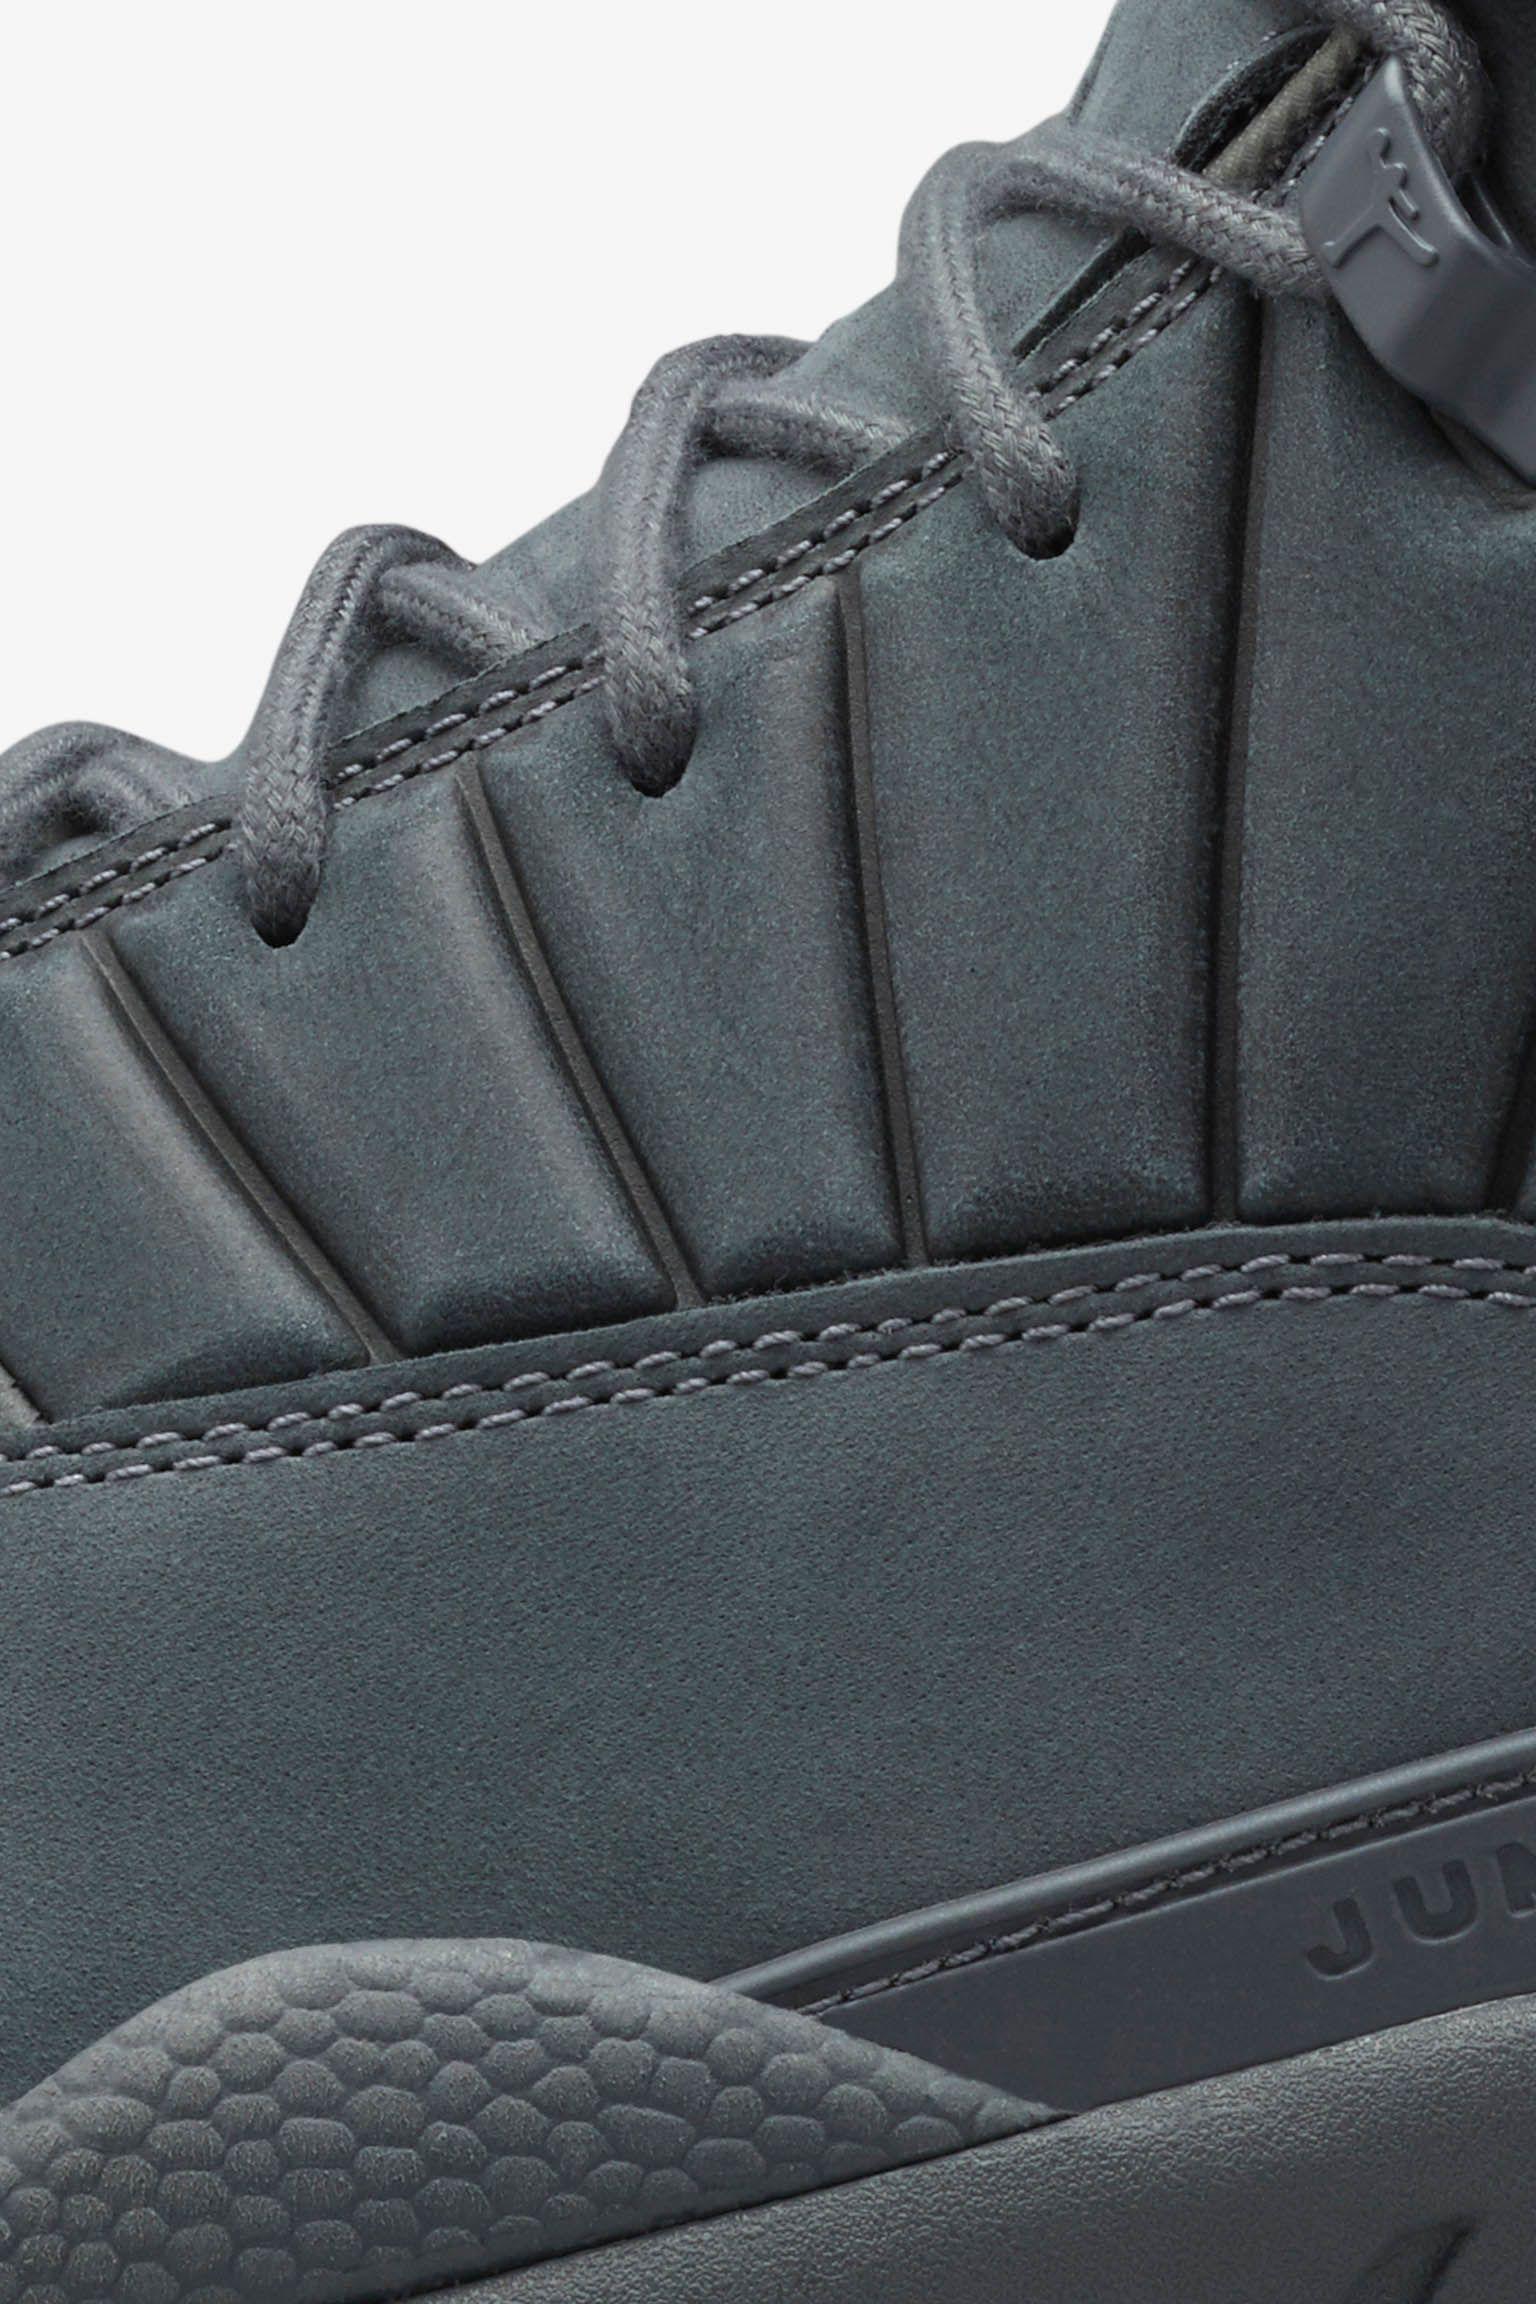 Air Jordan 12 Retro 'PSNY' Release Date